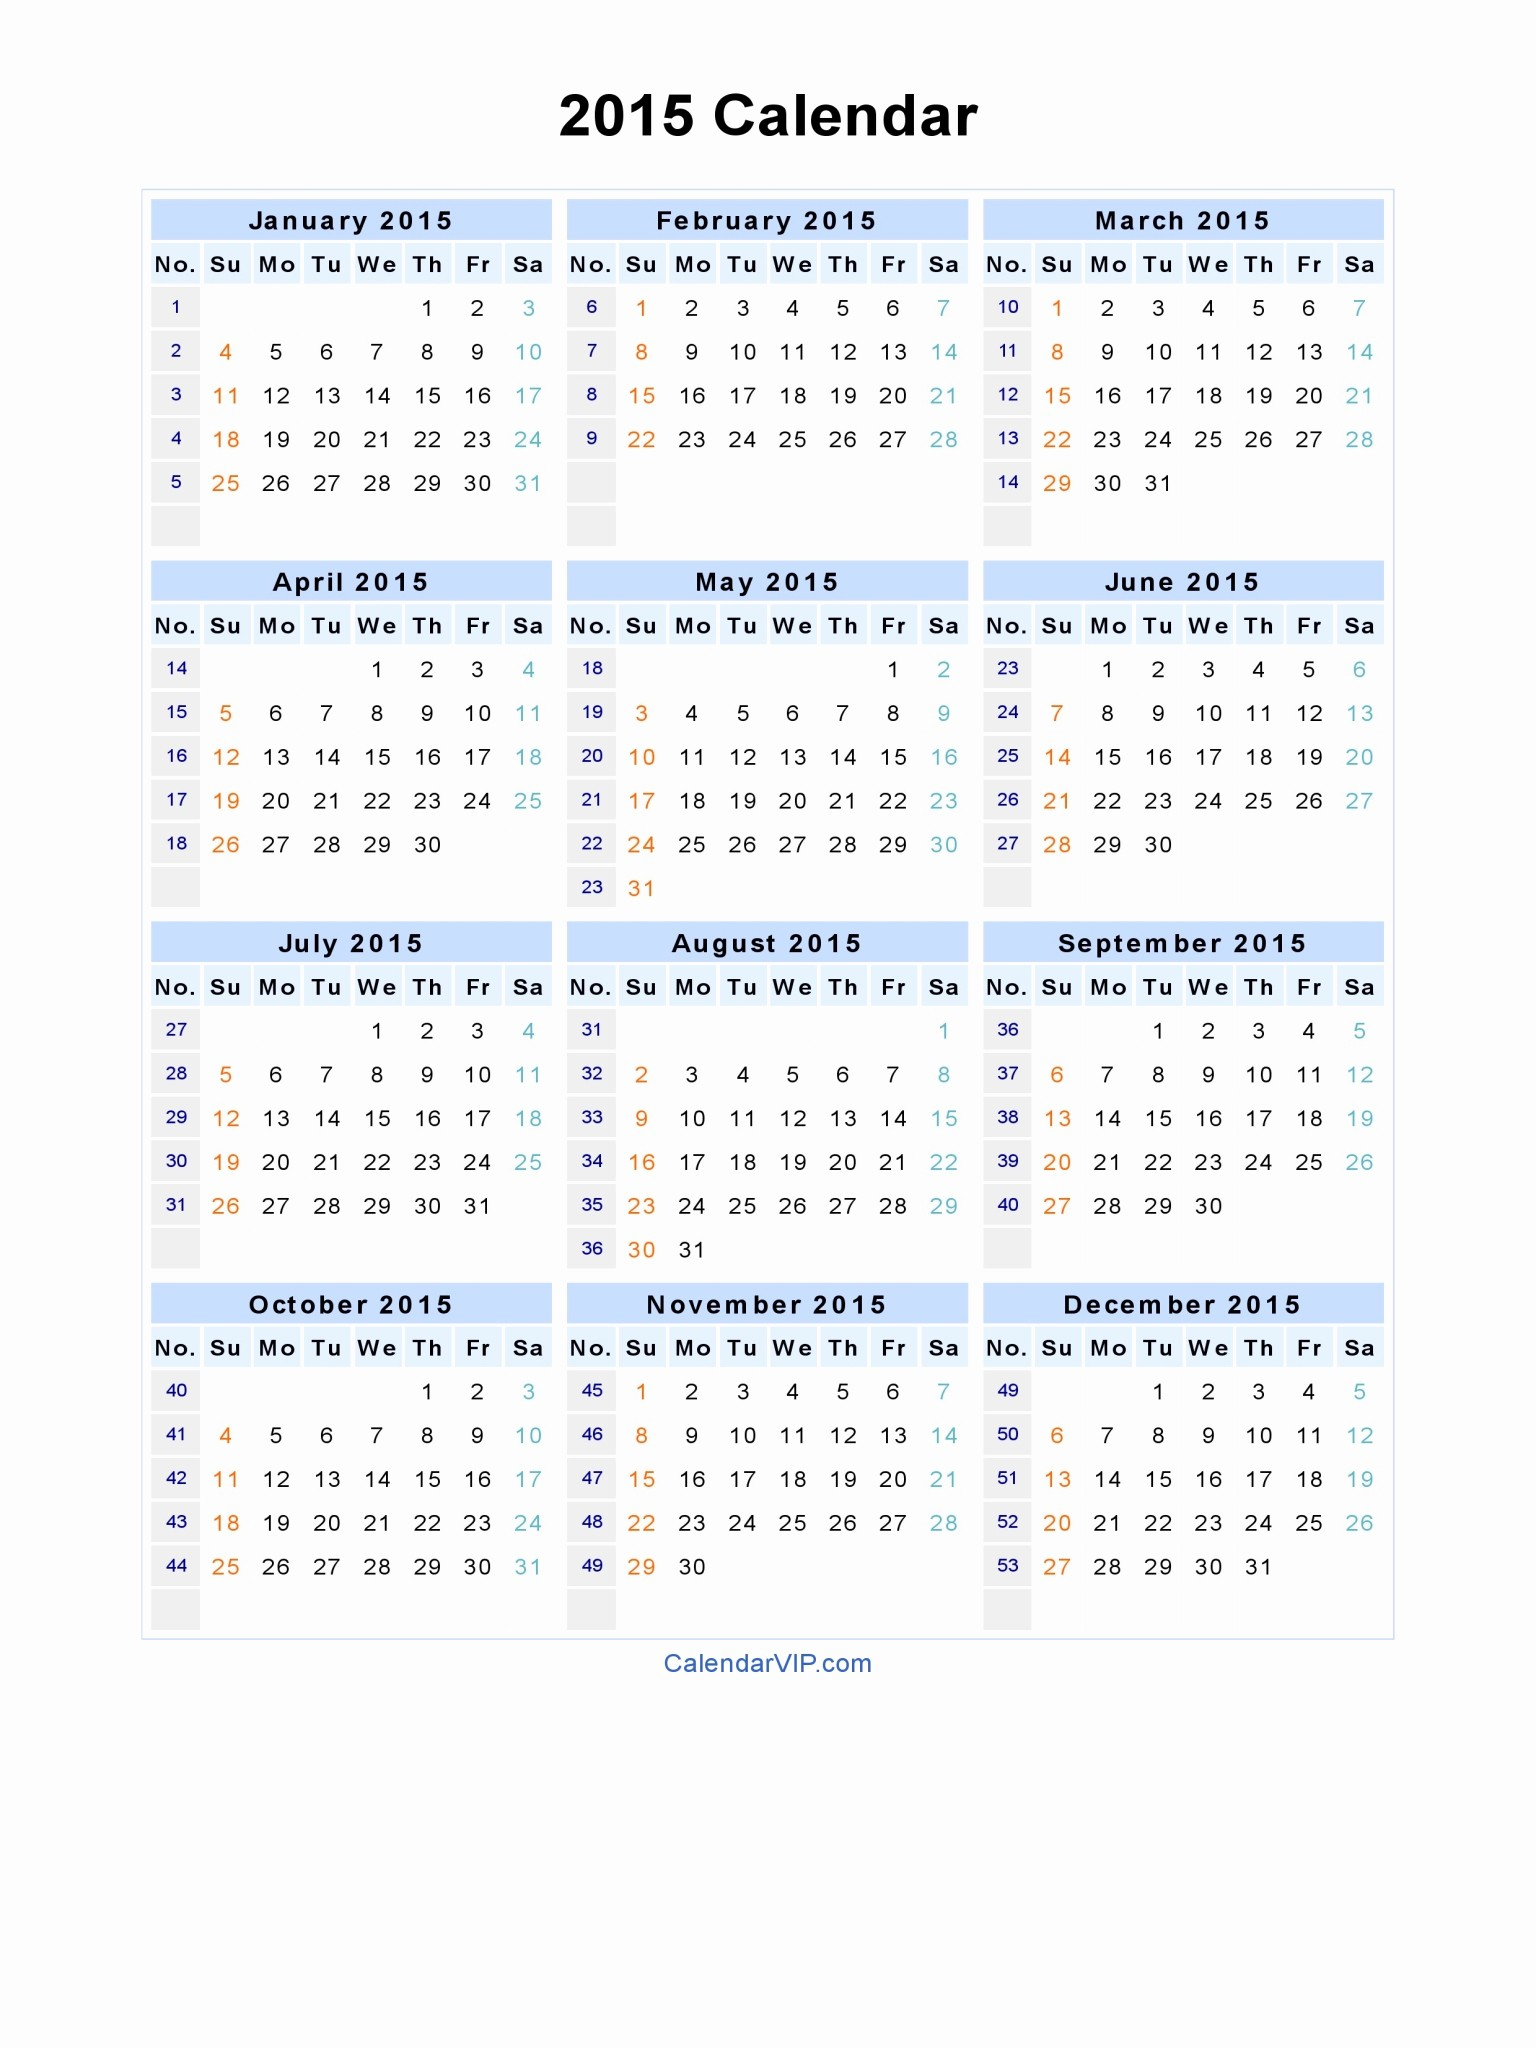 December 2015 Calendar Word Document Beautiful 2015 Calendar Blank Printable Calendar Template In Pdf